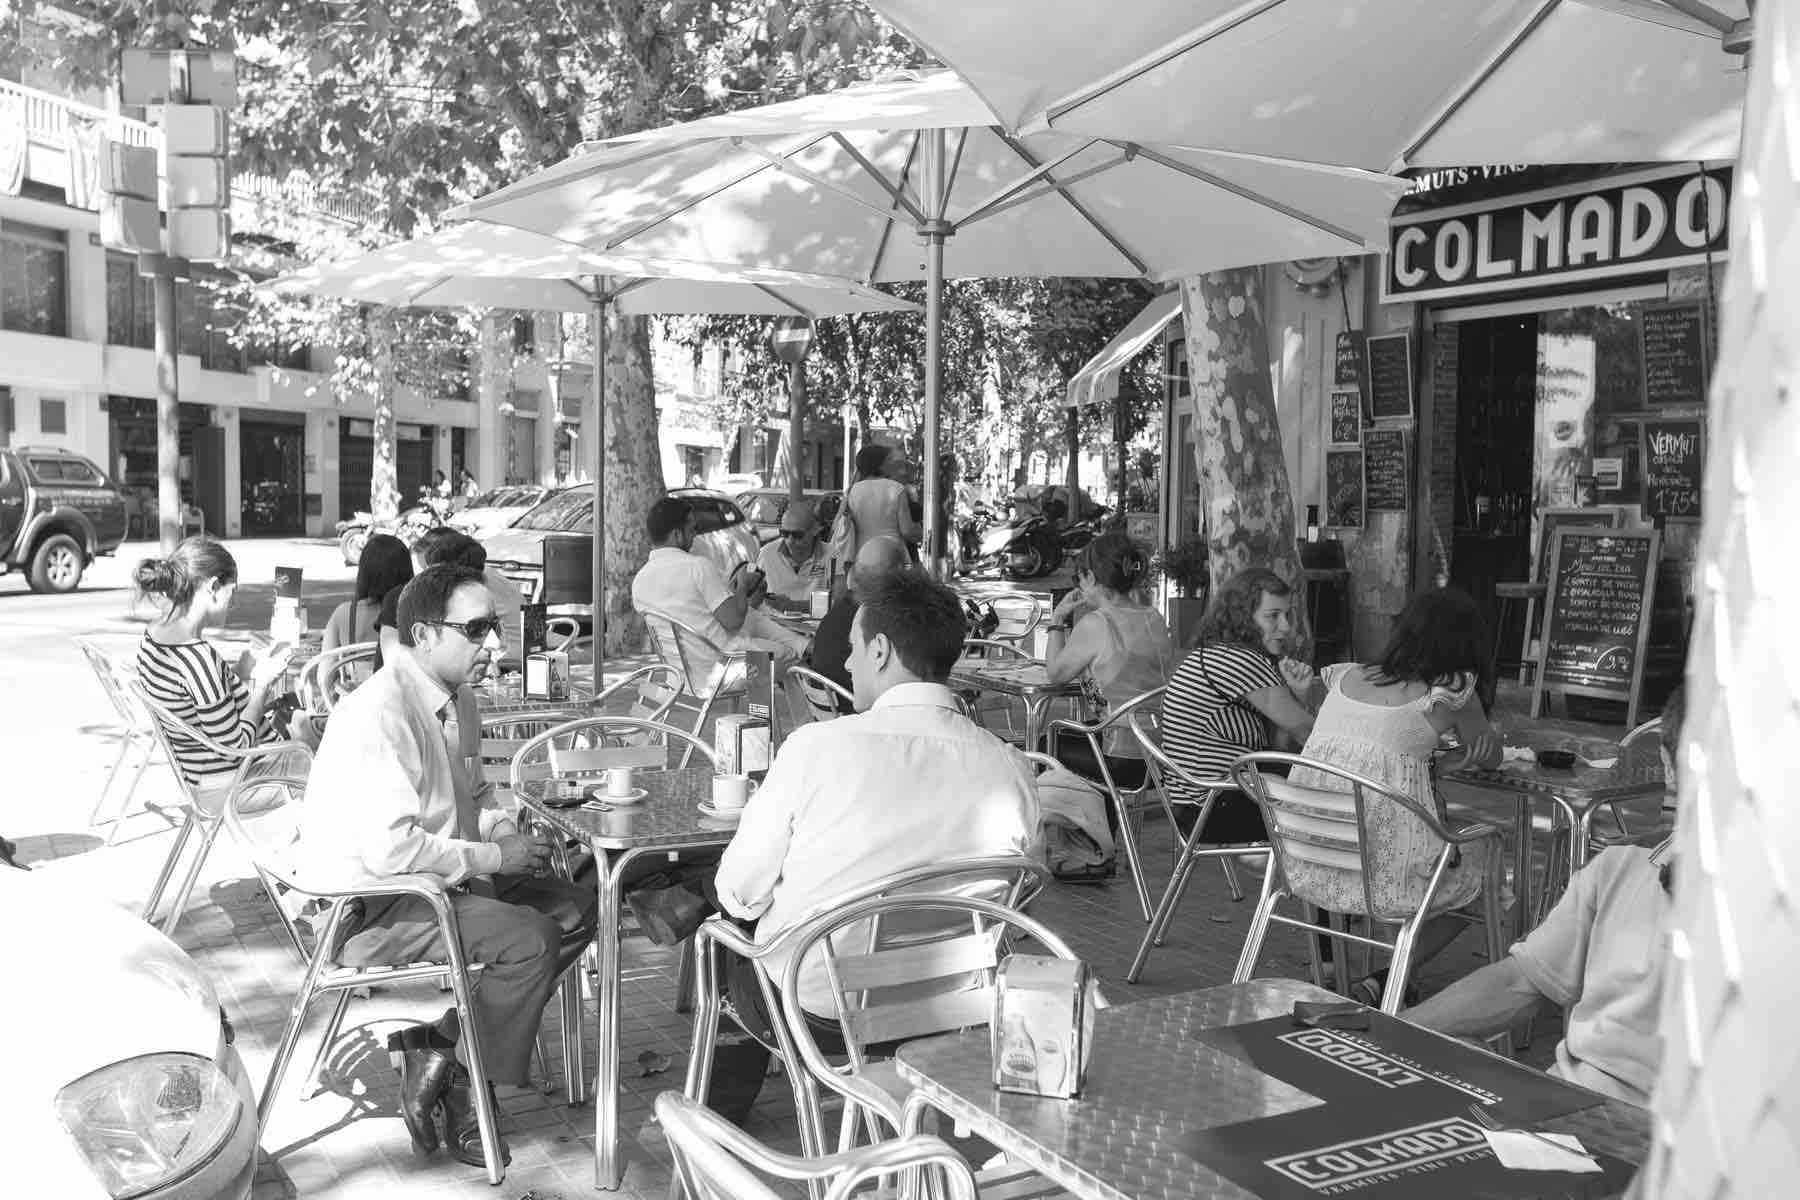 Colmado Barcelona